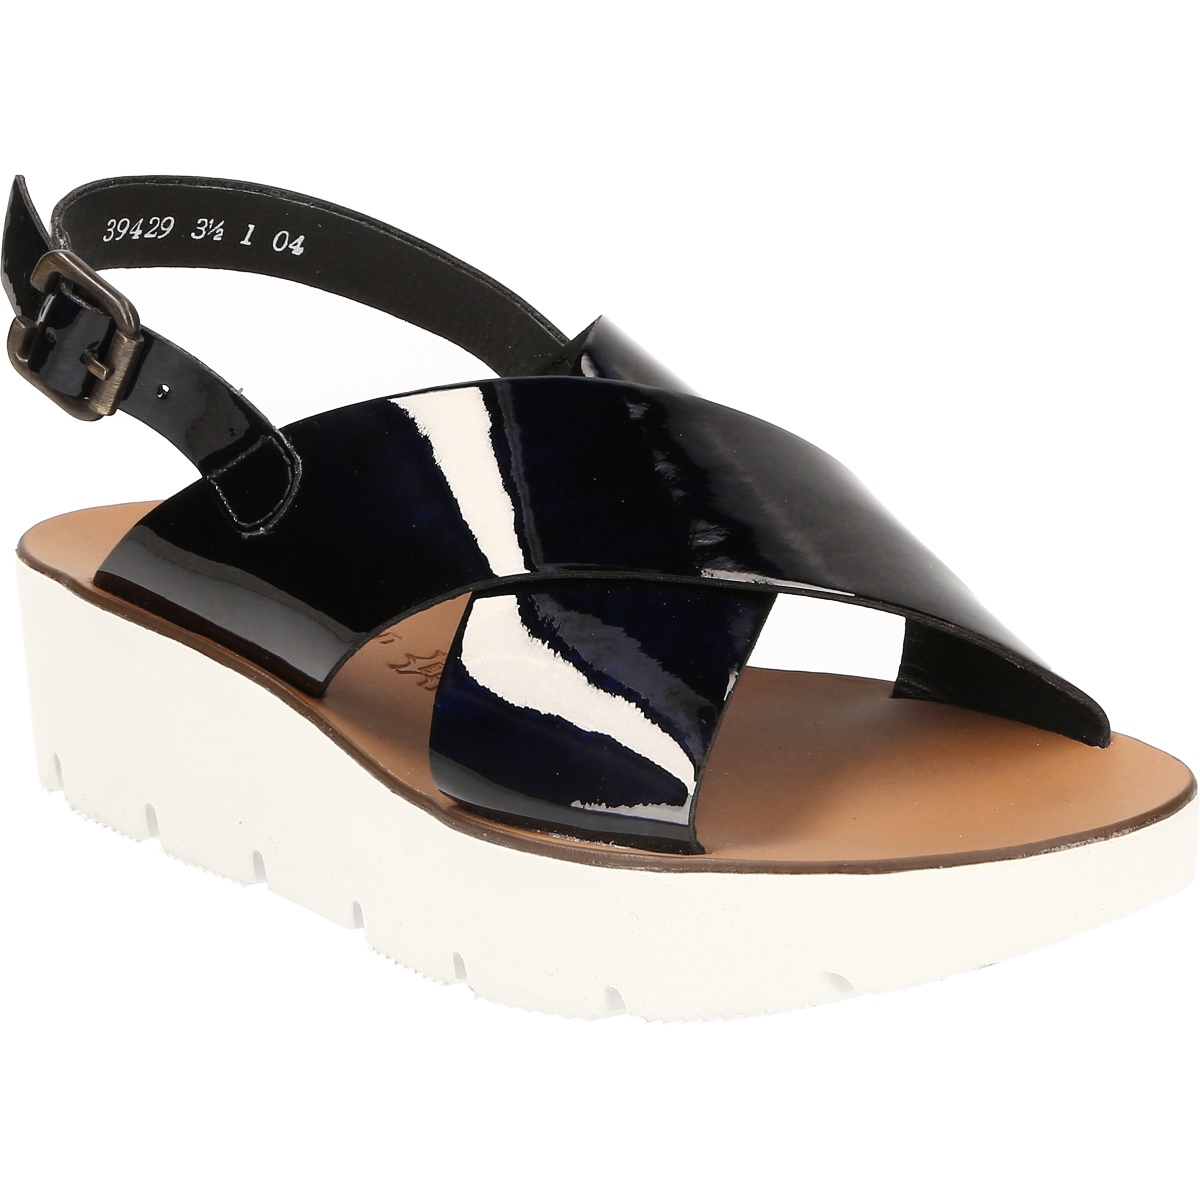 Paul Green 6989 Sandalette für Damen in dunkel-blau - 6989-032 bwT4Ul1WvI